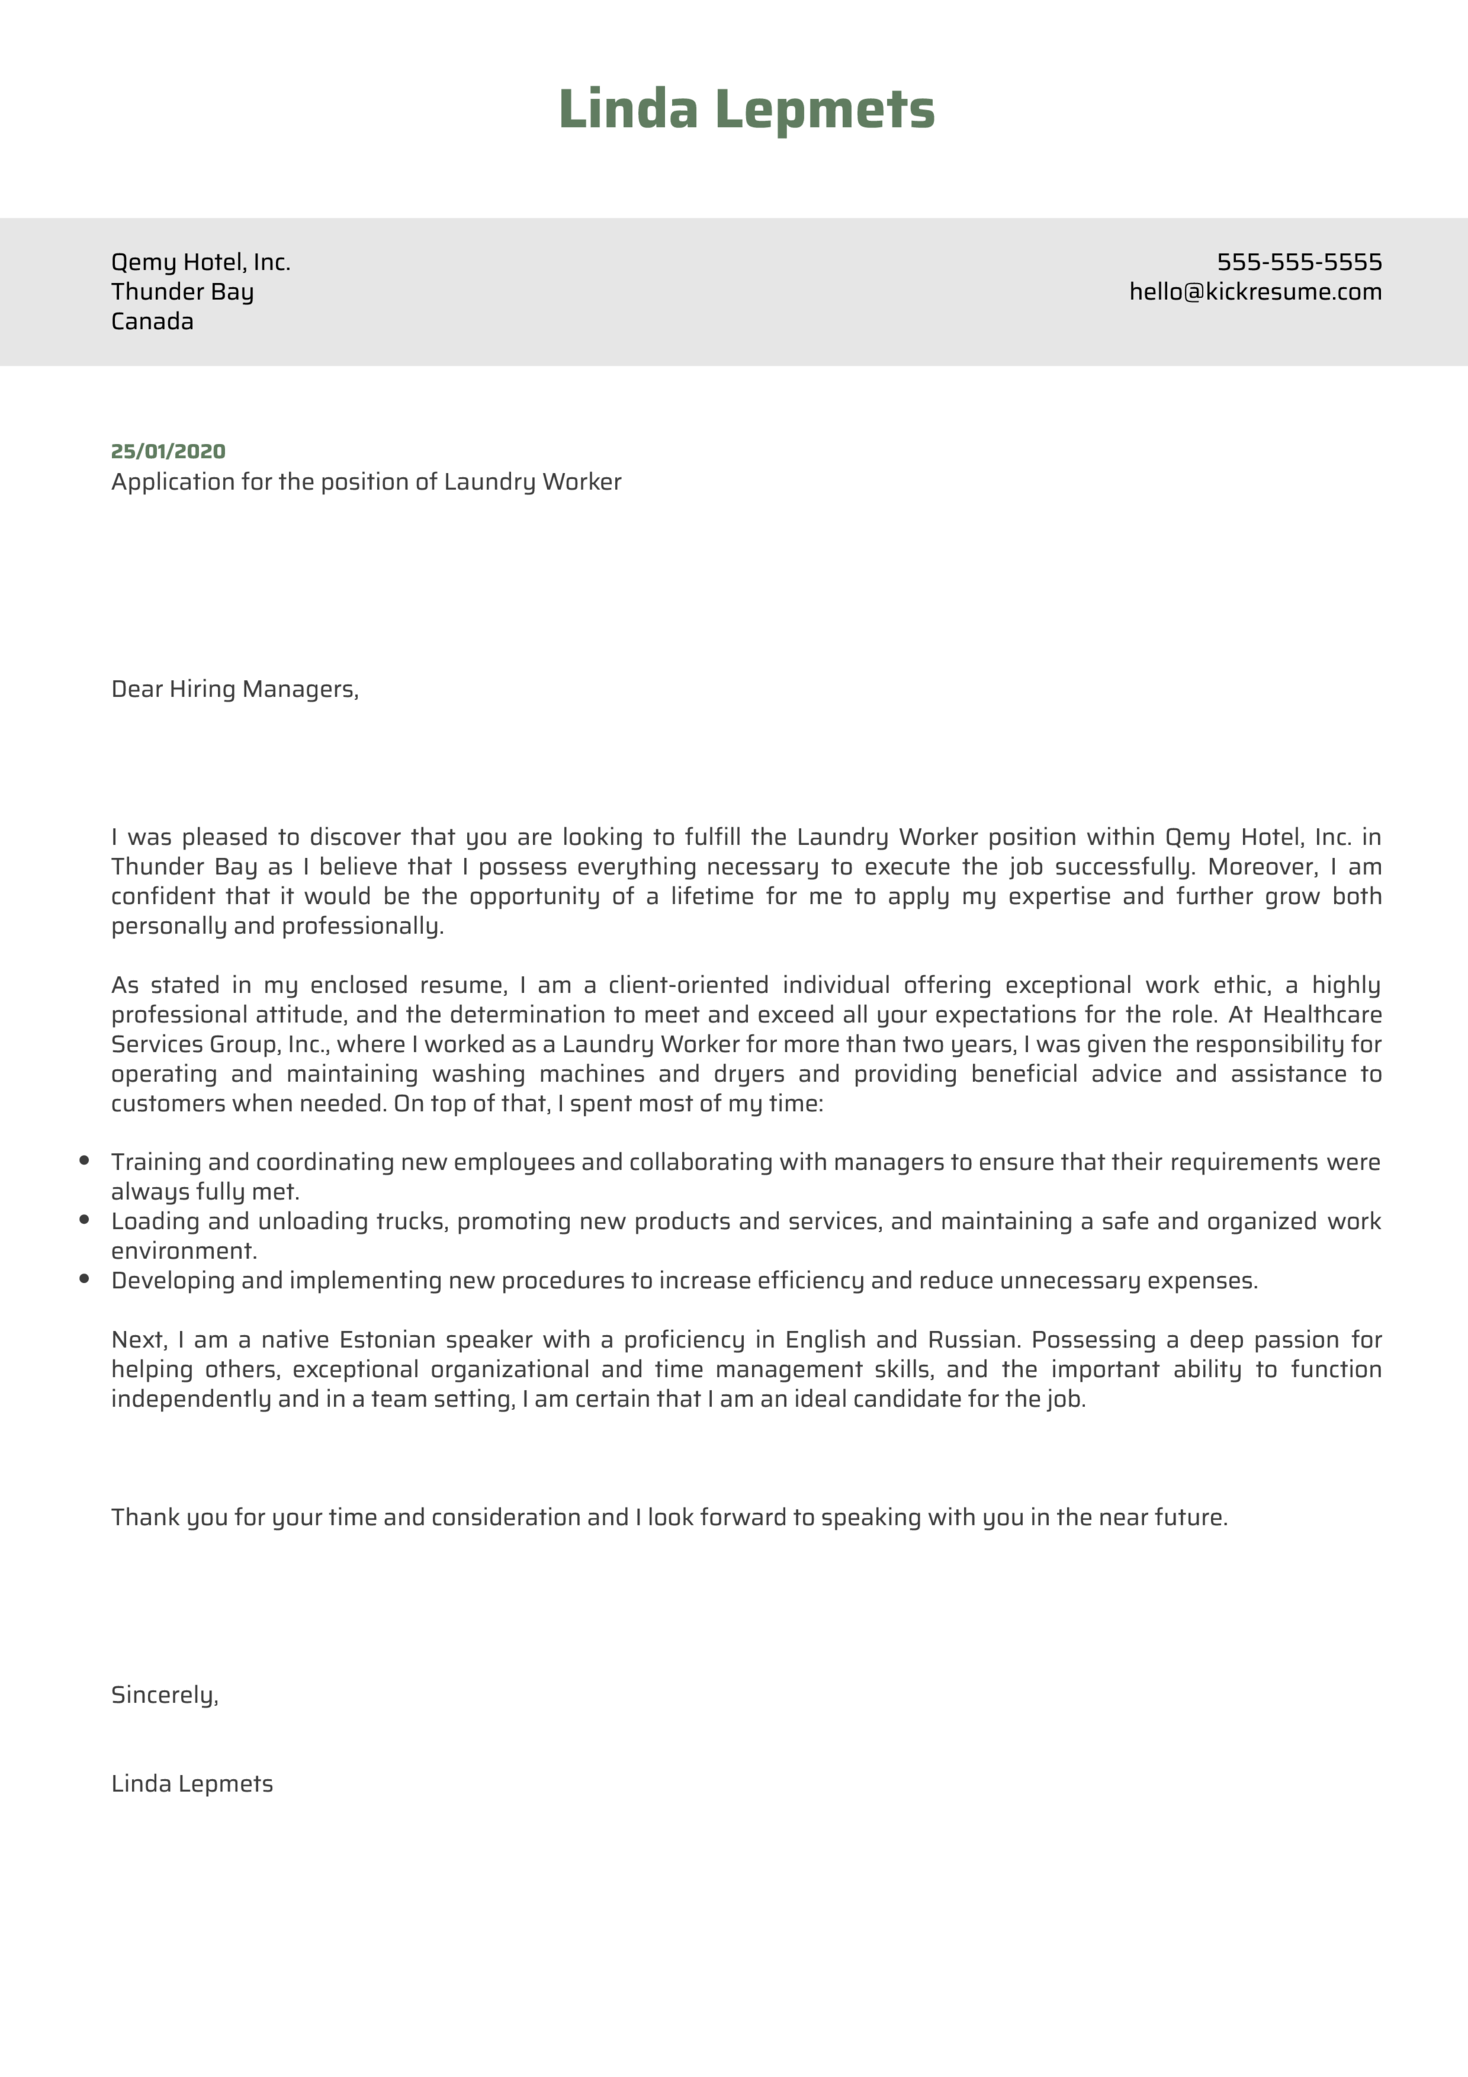 Laundry Worker Cover Letter Example Kickresume